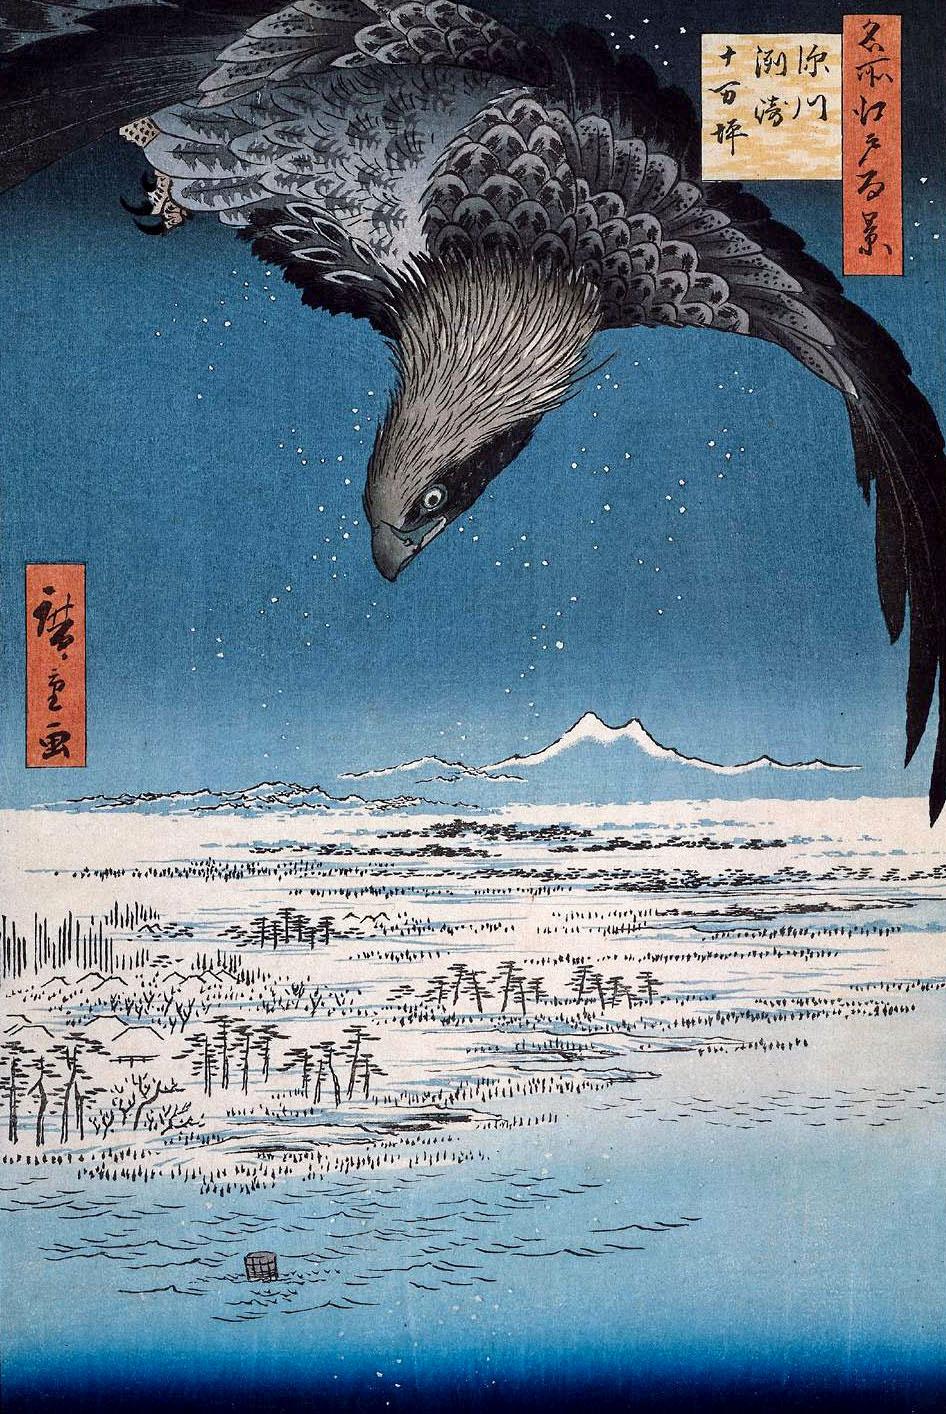 Eagle Over 100,000 Acre Plain at Susaki, Fukagawa, woodcut by Hiroshige, 19th century Japan. Public Domain